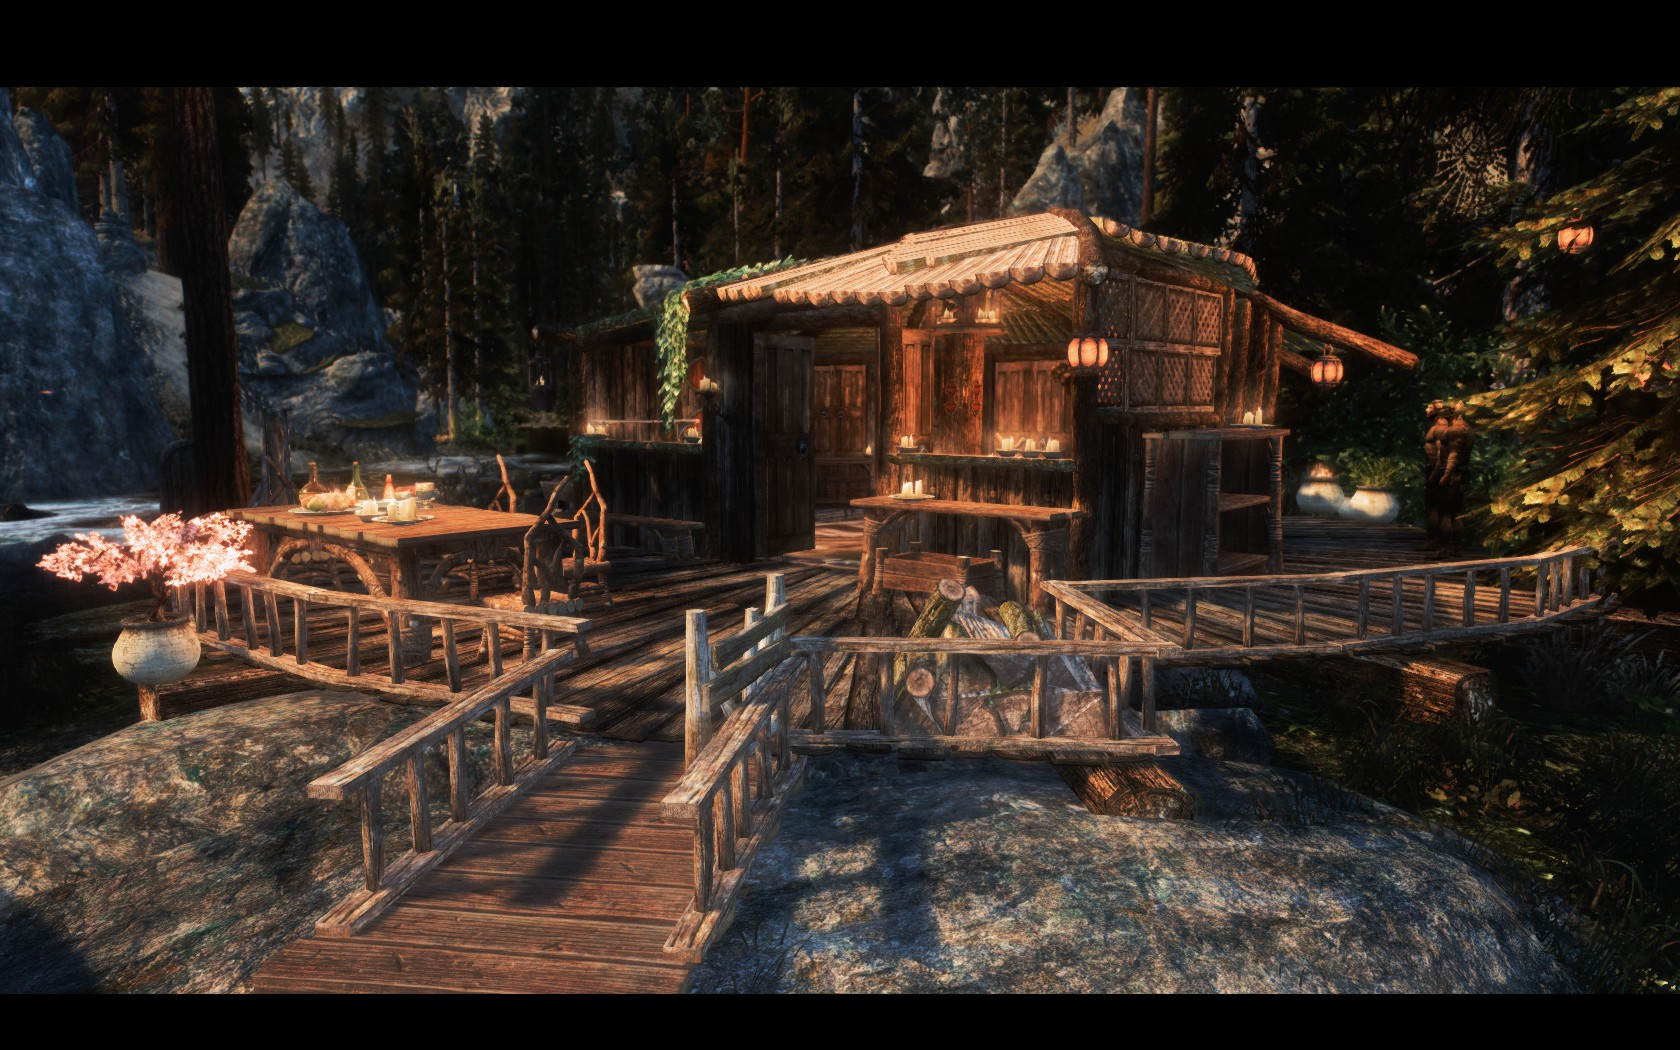 Yggdrasil Cottage